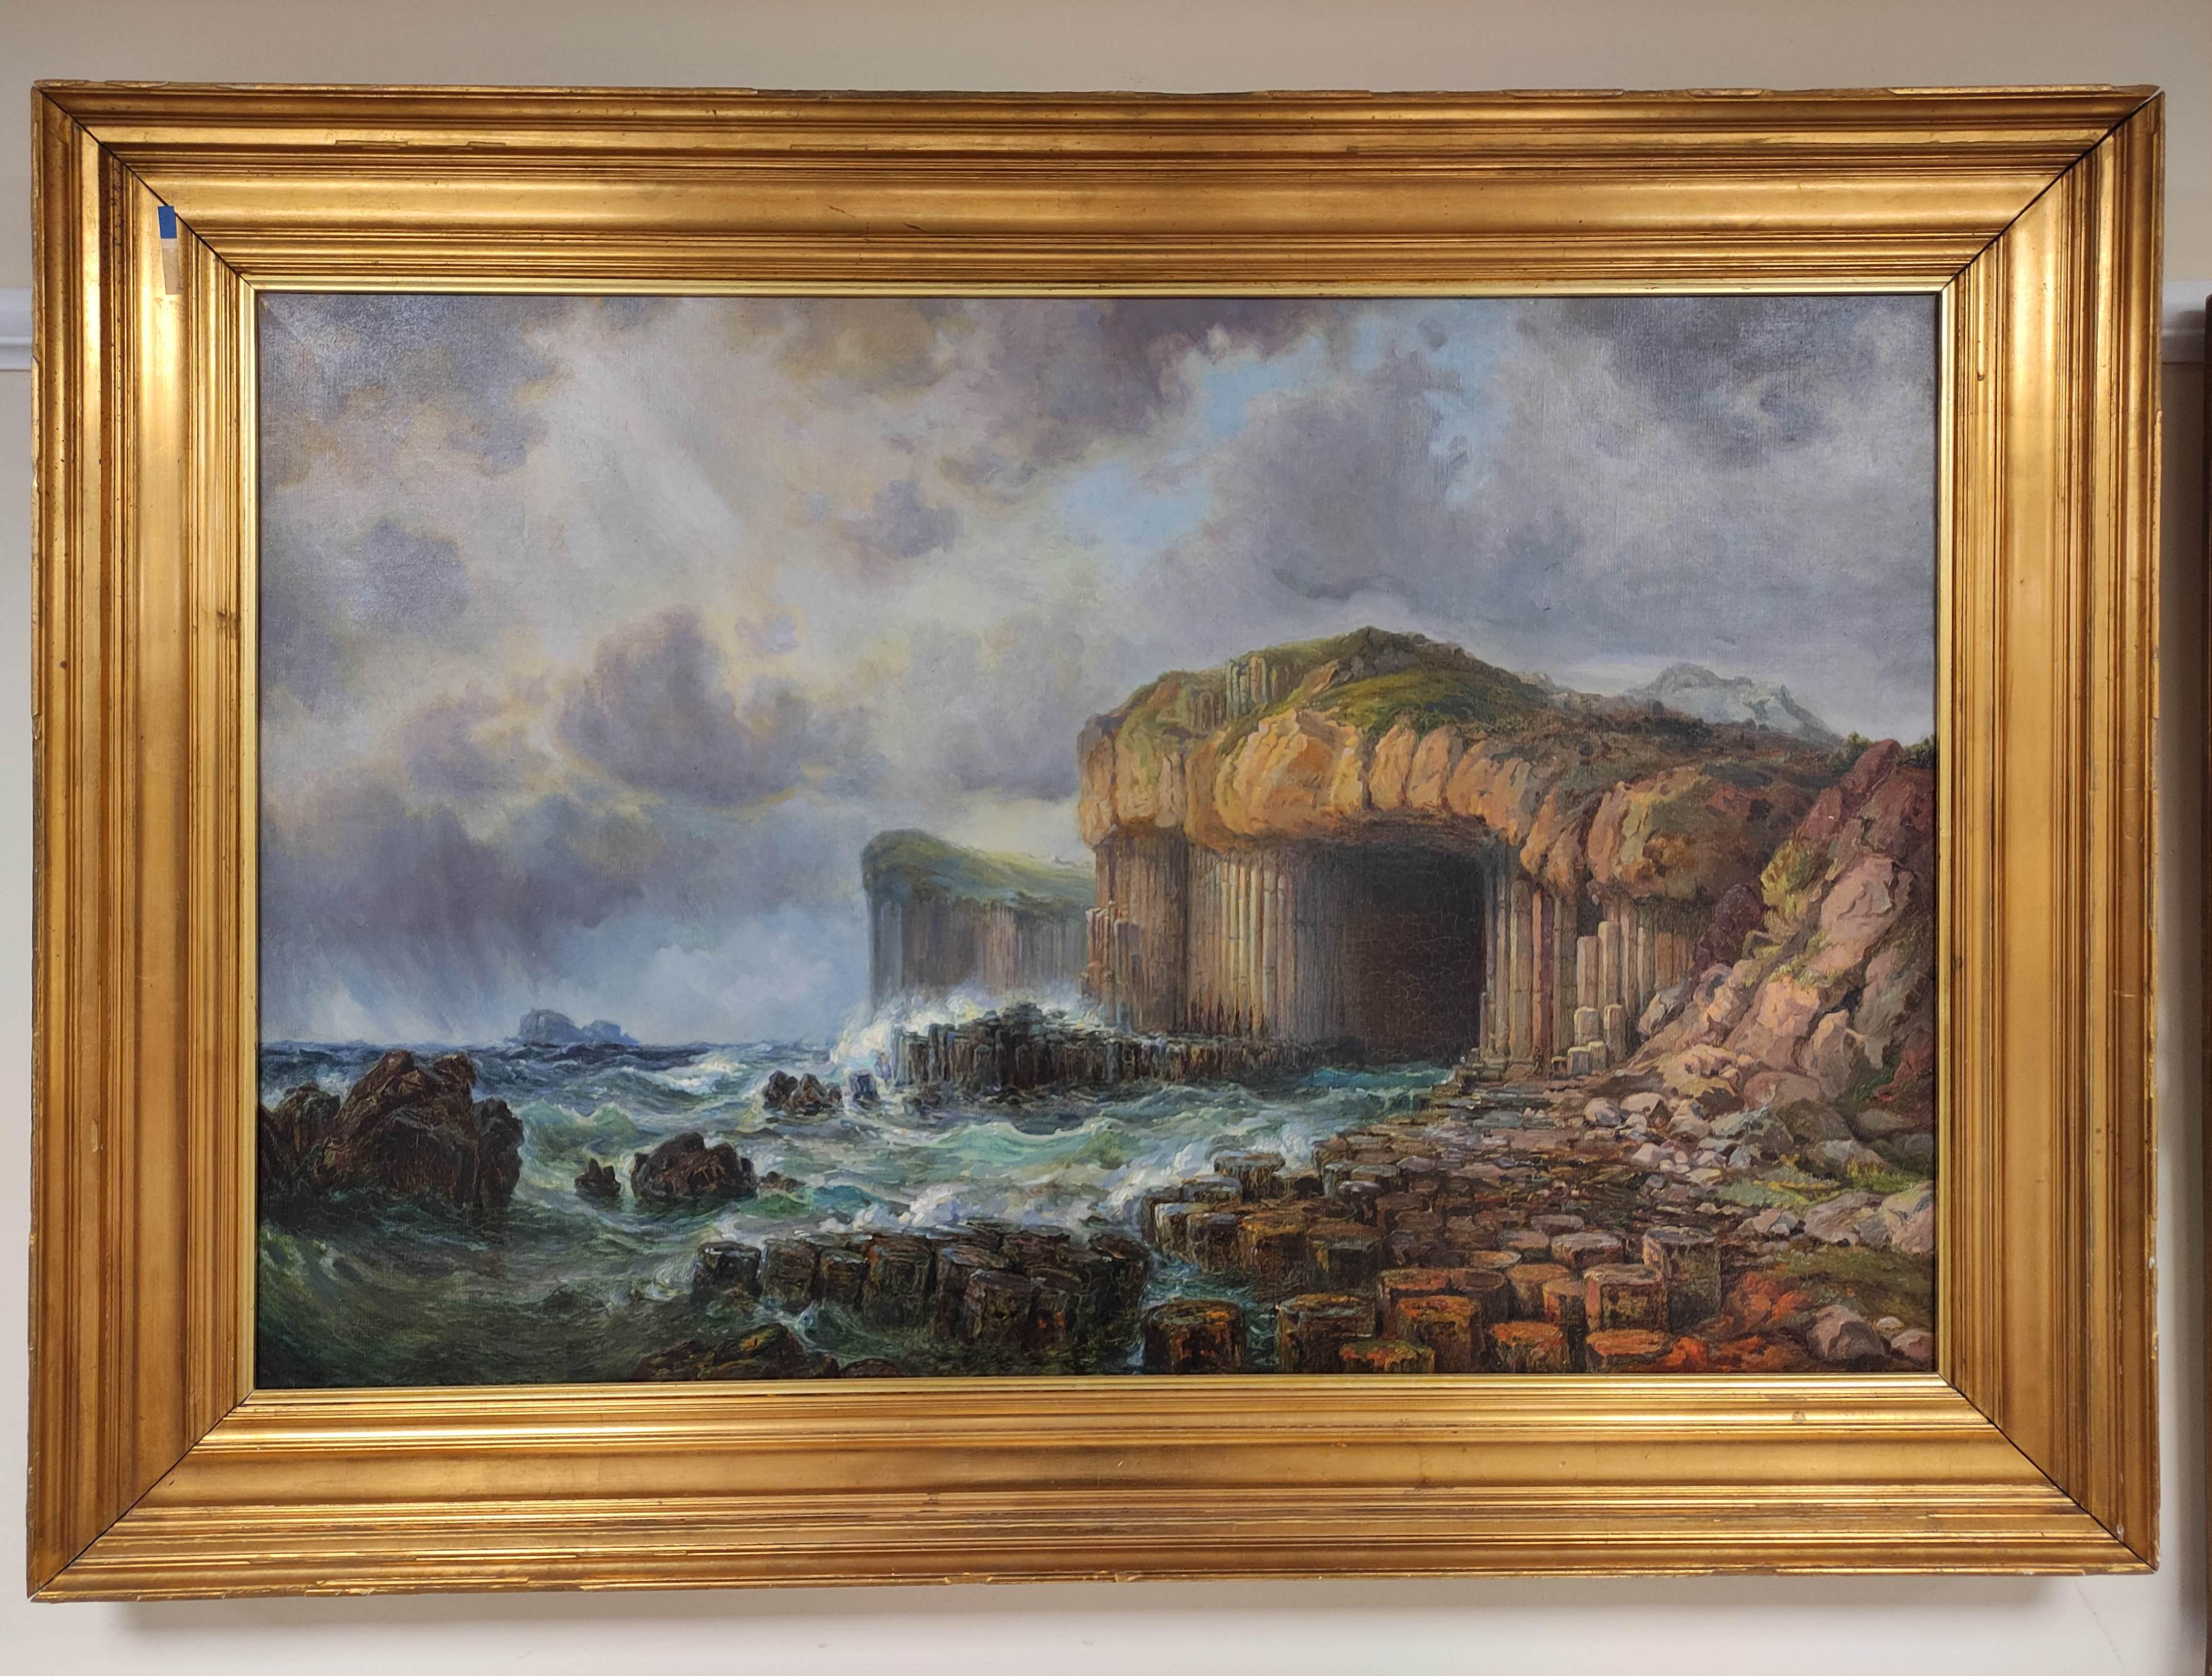 SCOTTISH SCHOOL C.1800. Fingals Cave, Staffa. Oil on canvas. 58cm x 88cm.